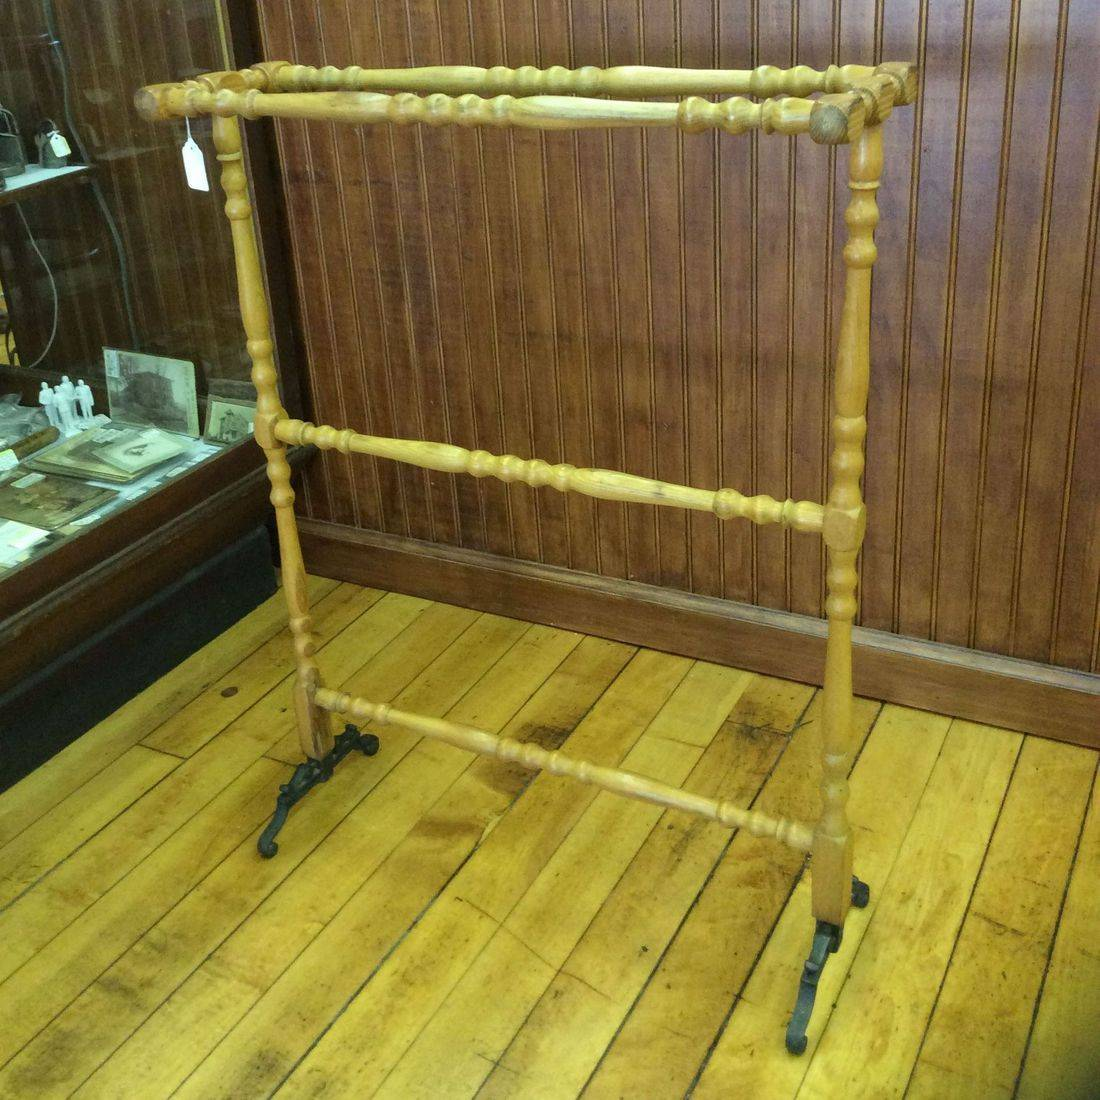 "Vintage Maple Blanket/Towel Stand w/Cast Iron Feet  22-1/2""W x 8""D x 30""H.  $65.00"